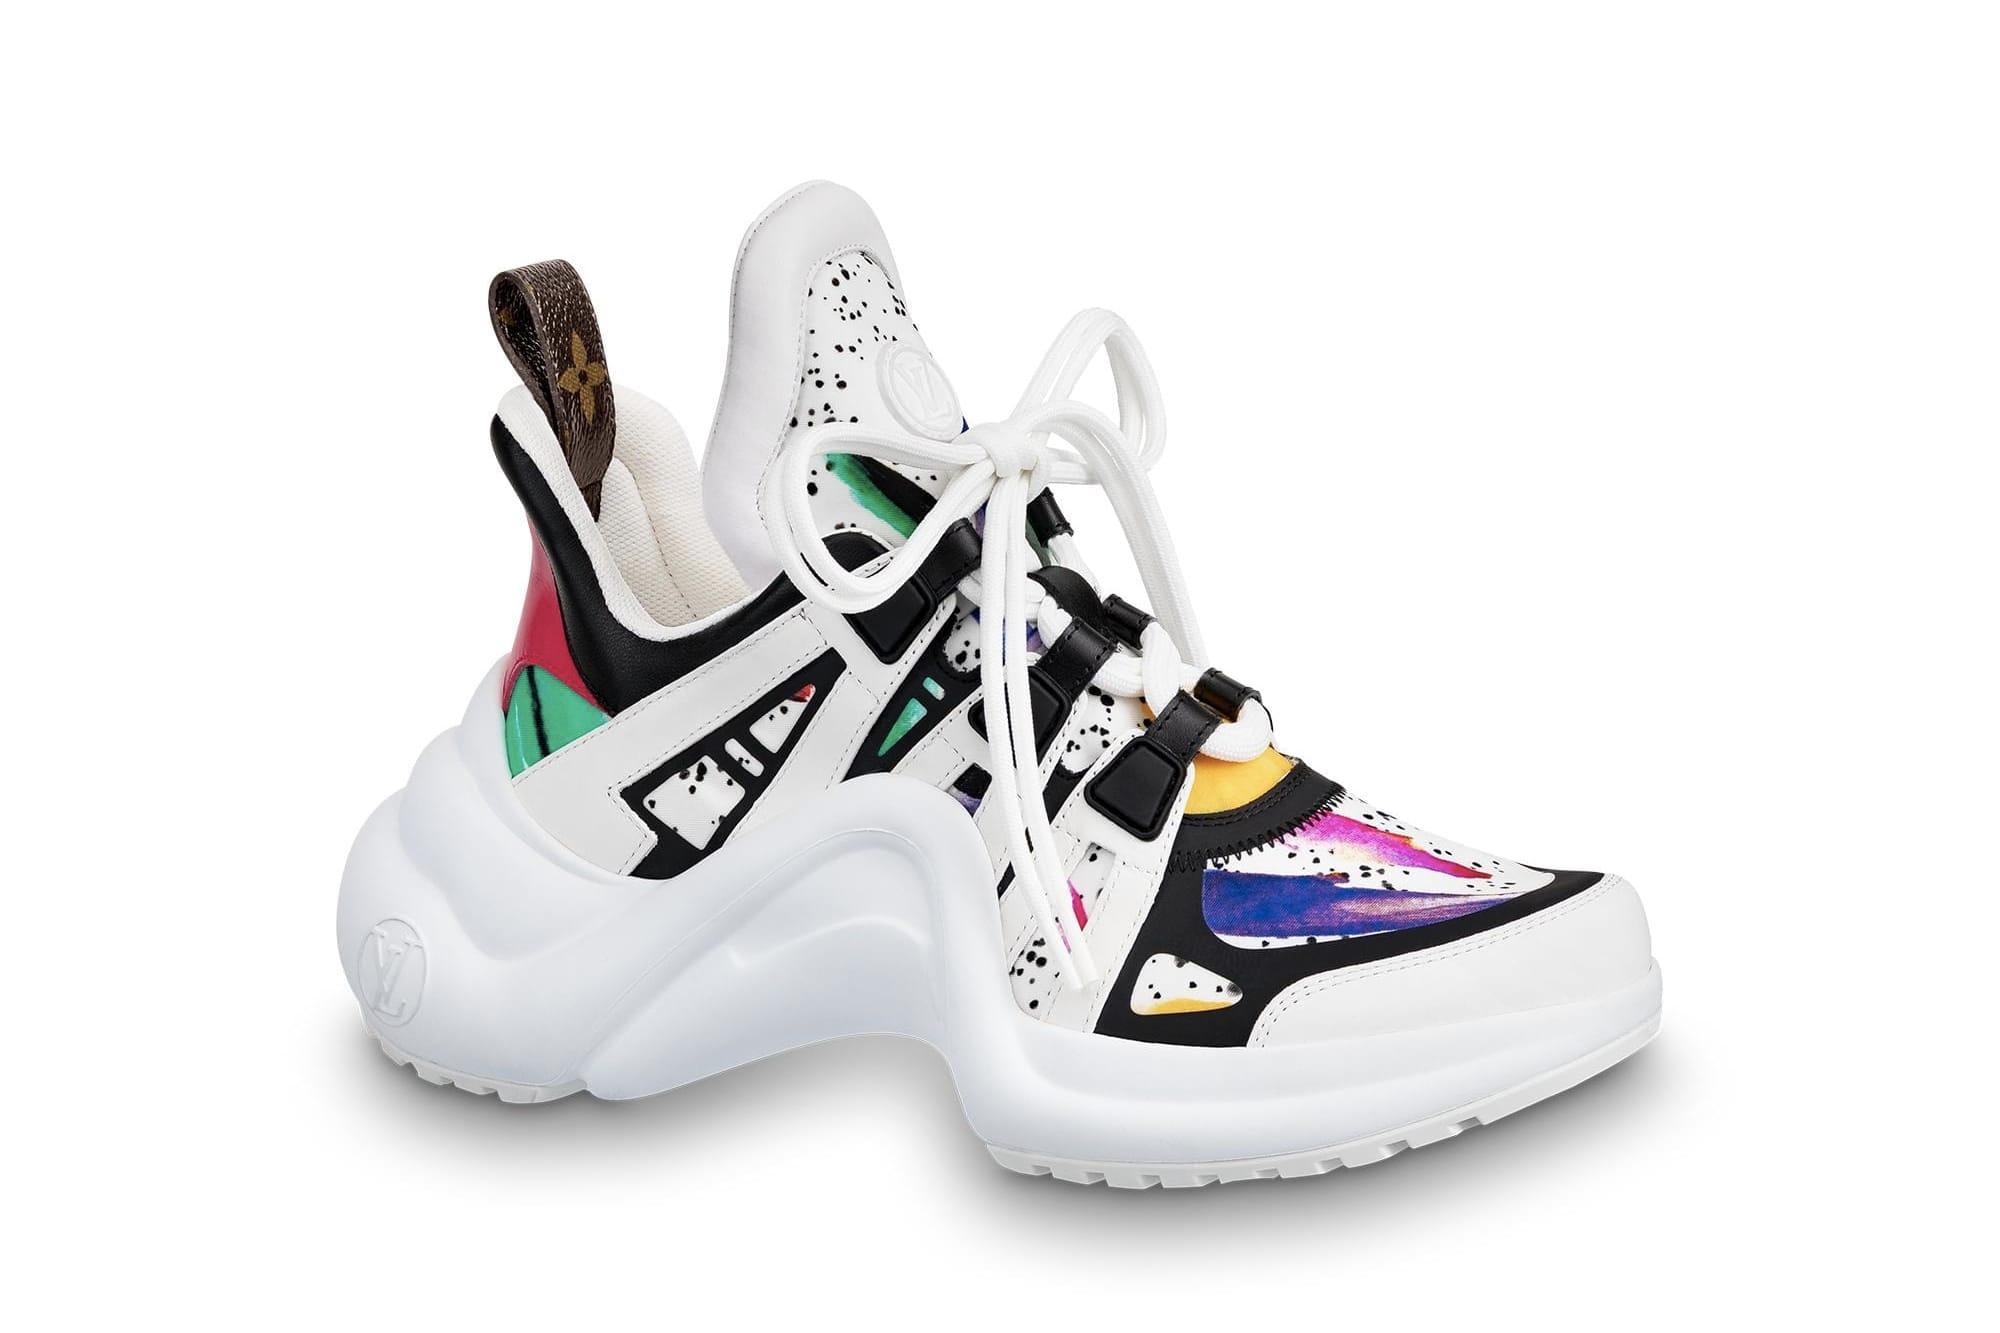 Best Sneaker to Wear Based on Your Zodiac Sign